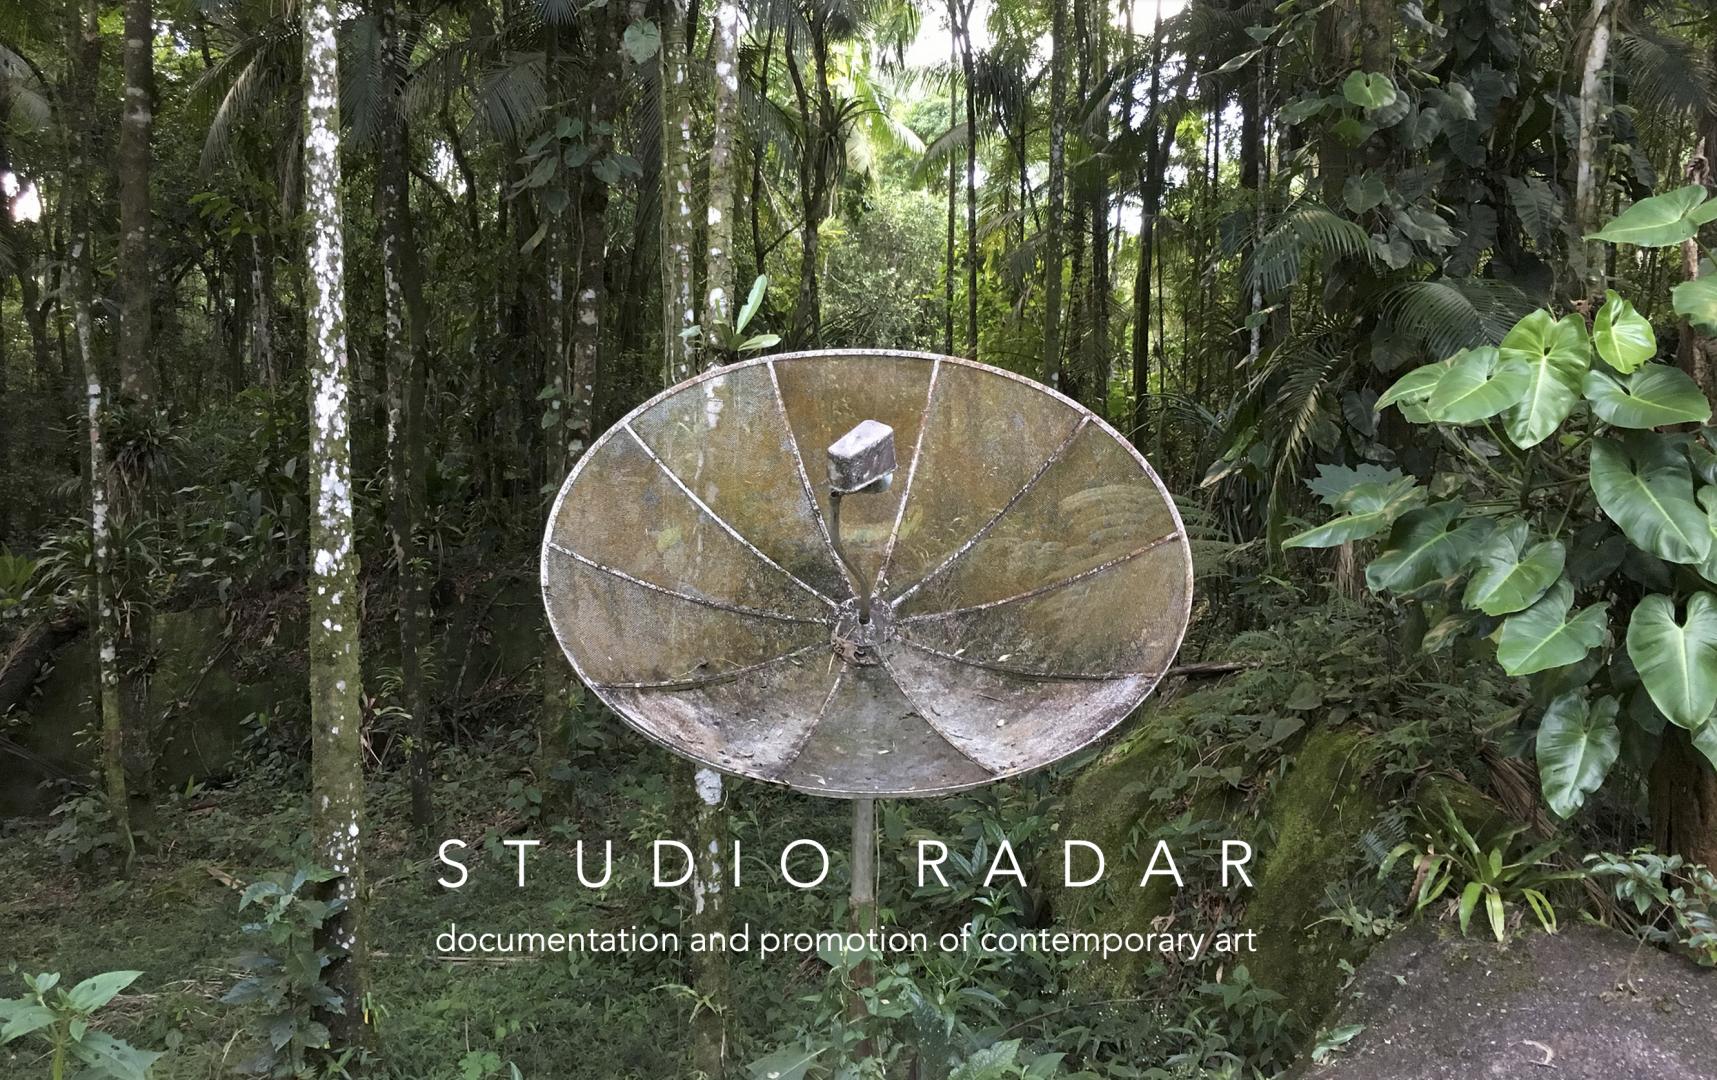 Studio Radar